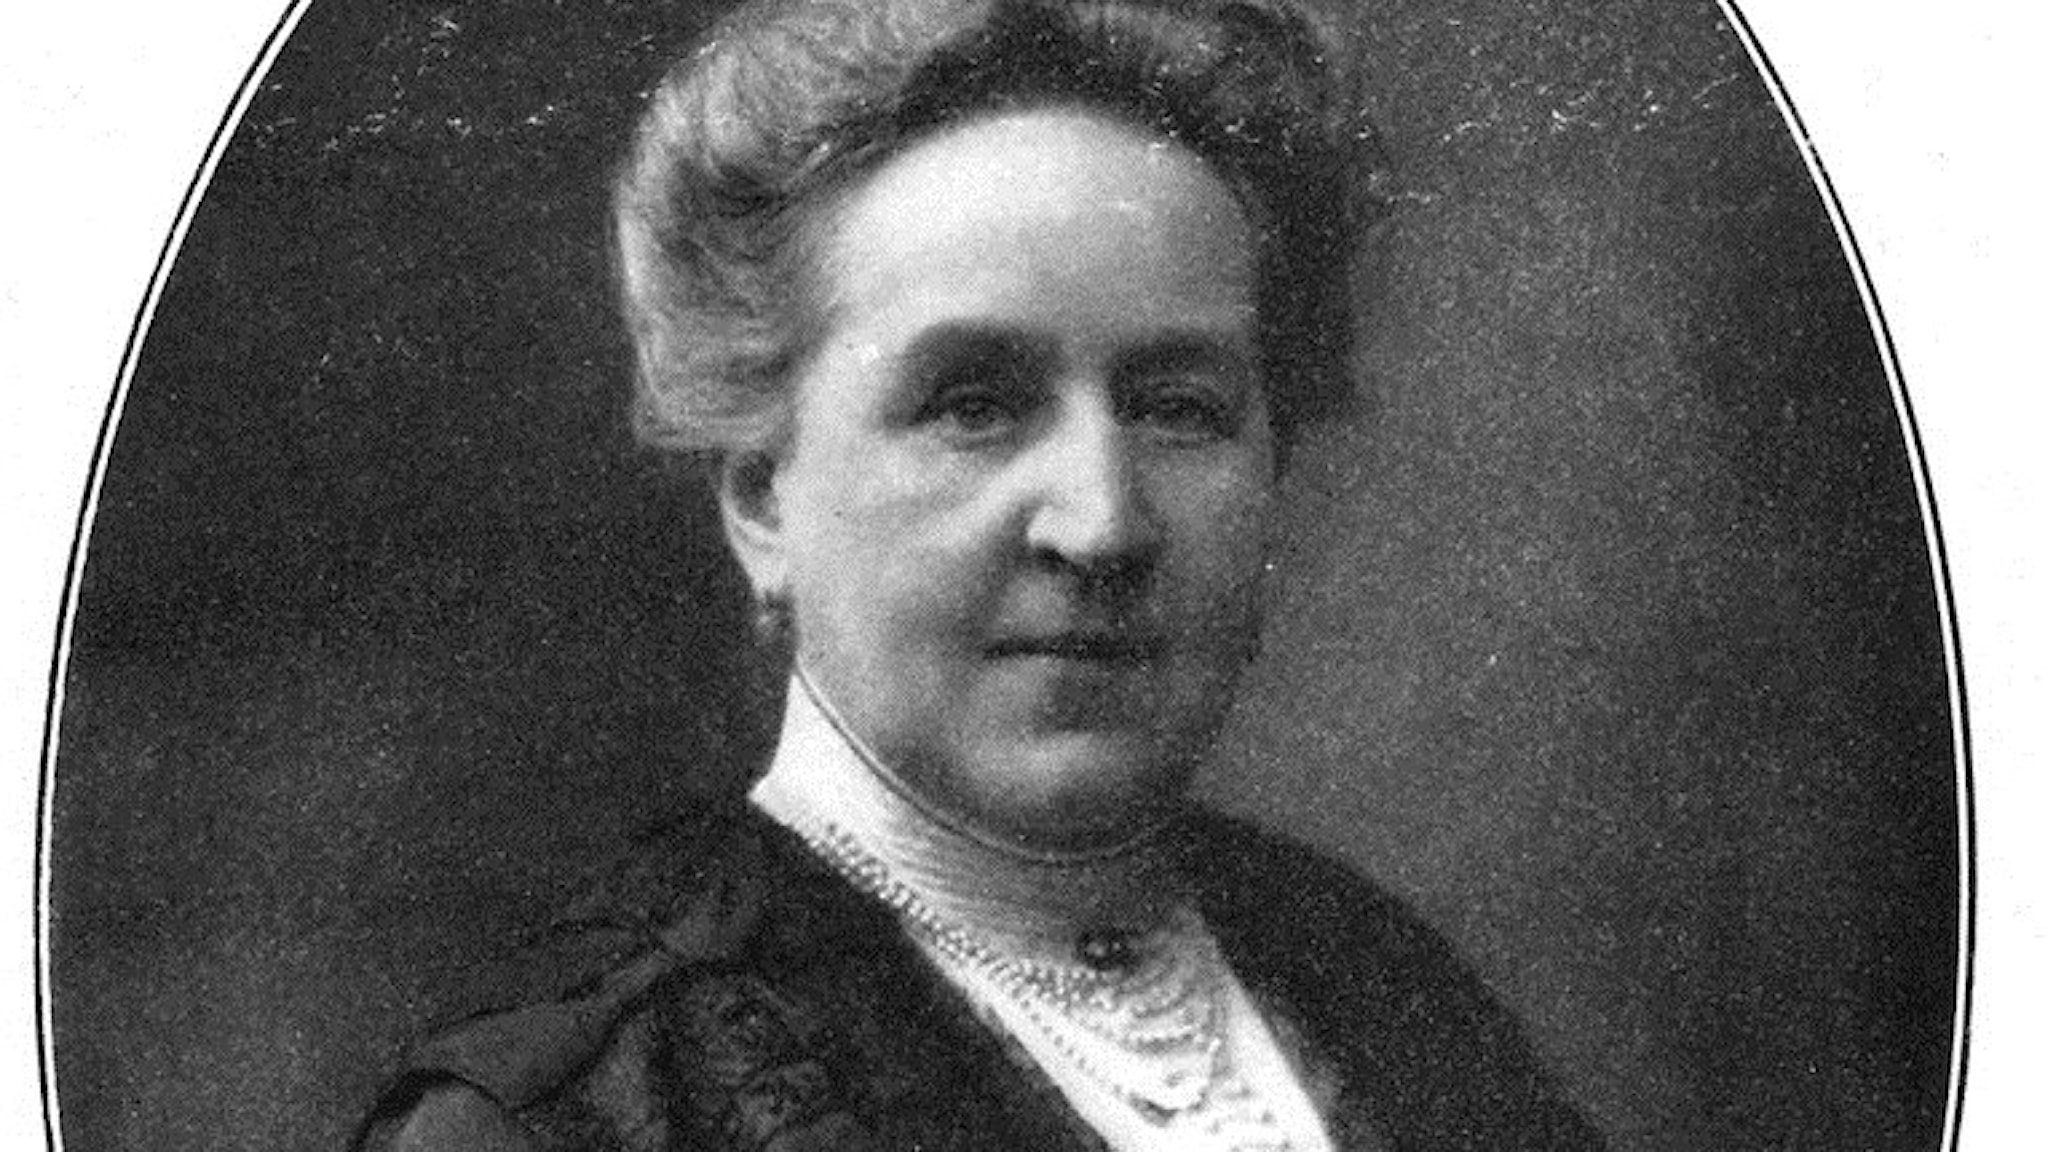 Helena Munktell